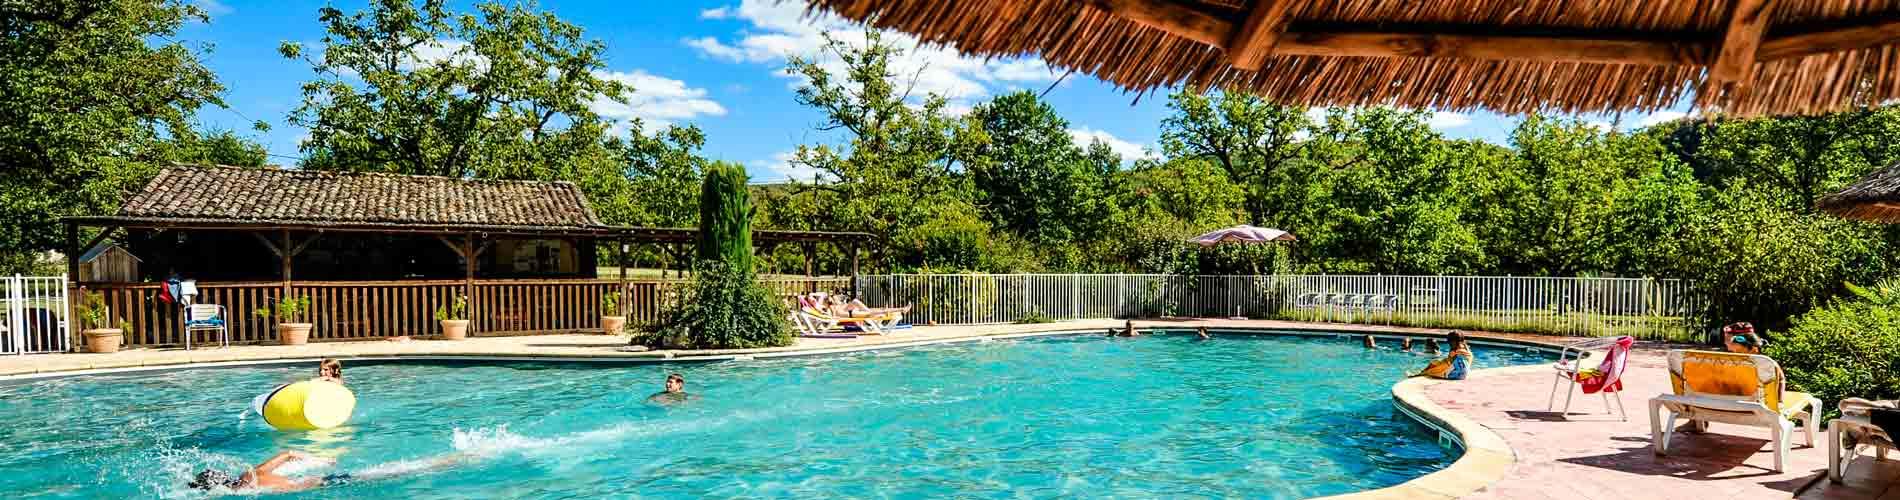 Camping lot avec piscine camping avec espace quatique for Camping sarthe avec piscine